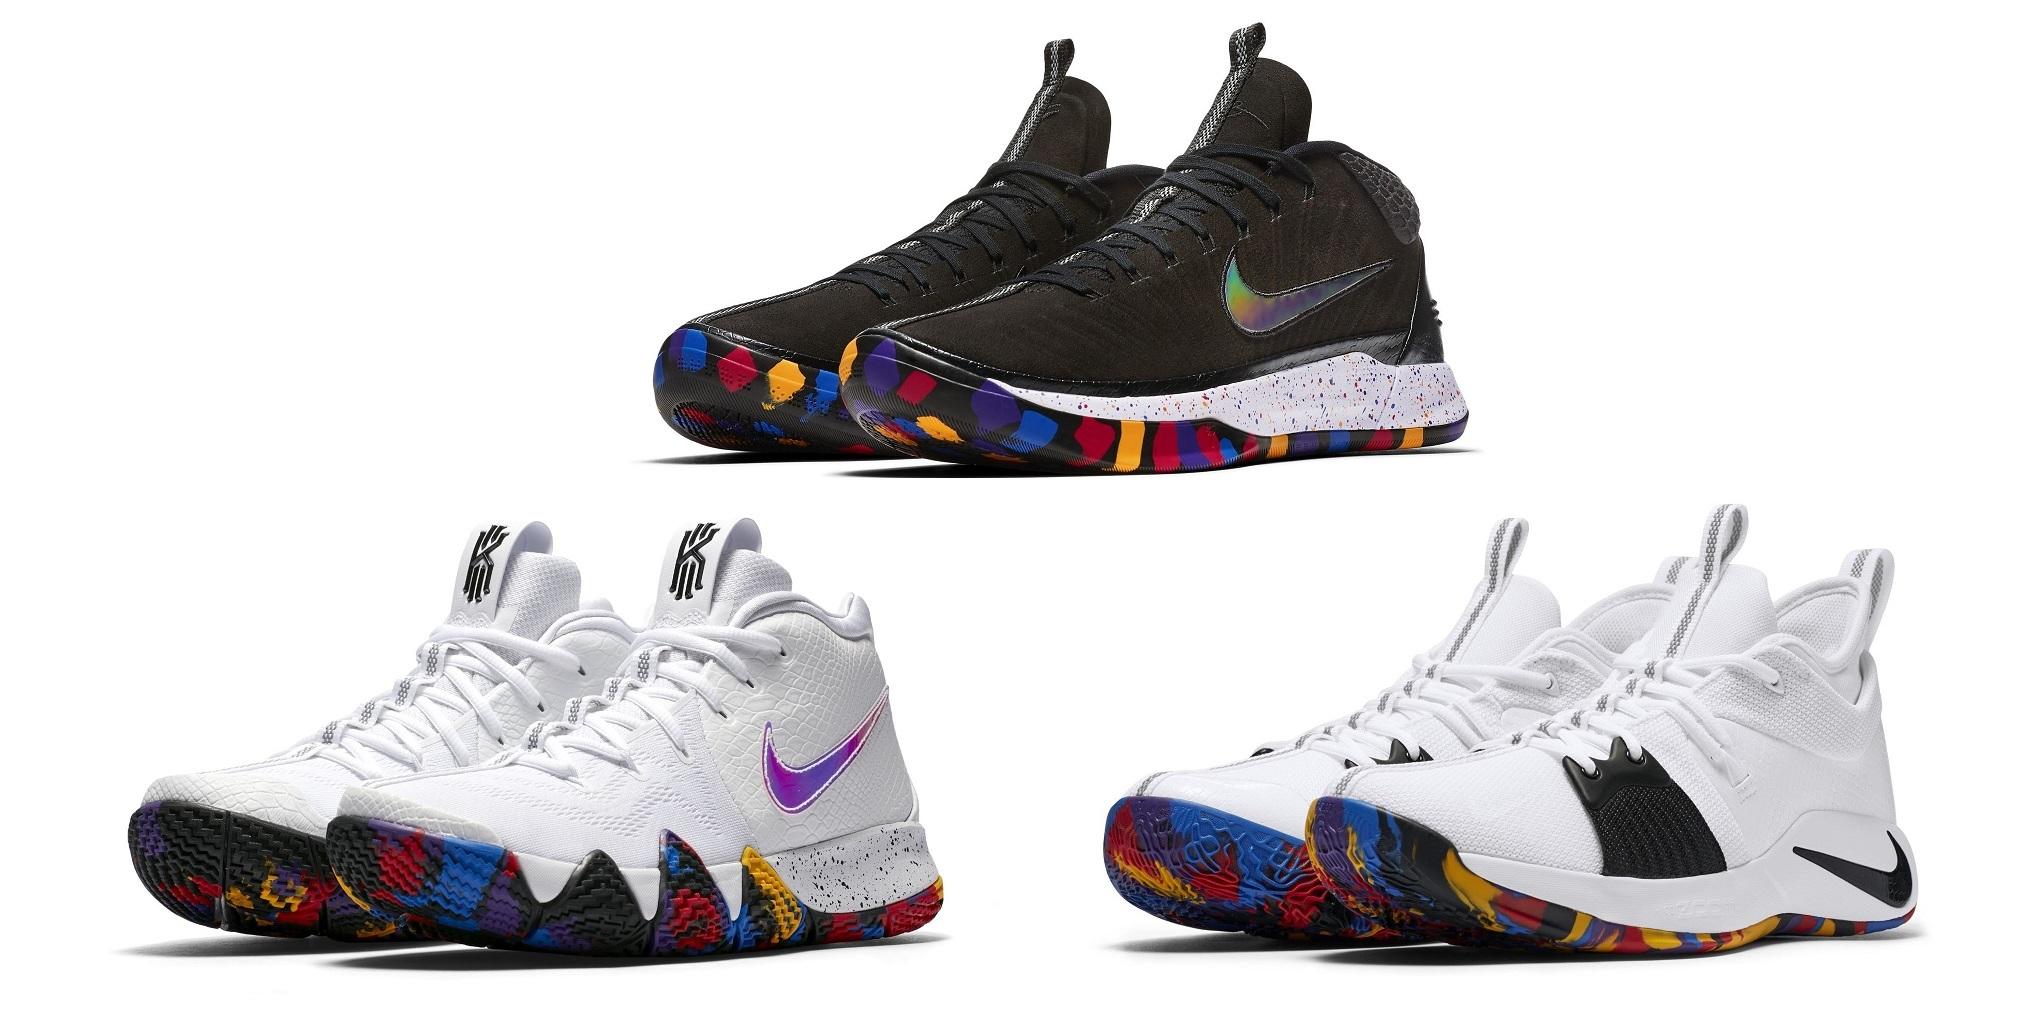 nike kobe ad march madness Sale Nike